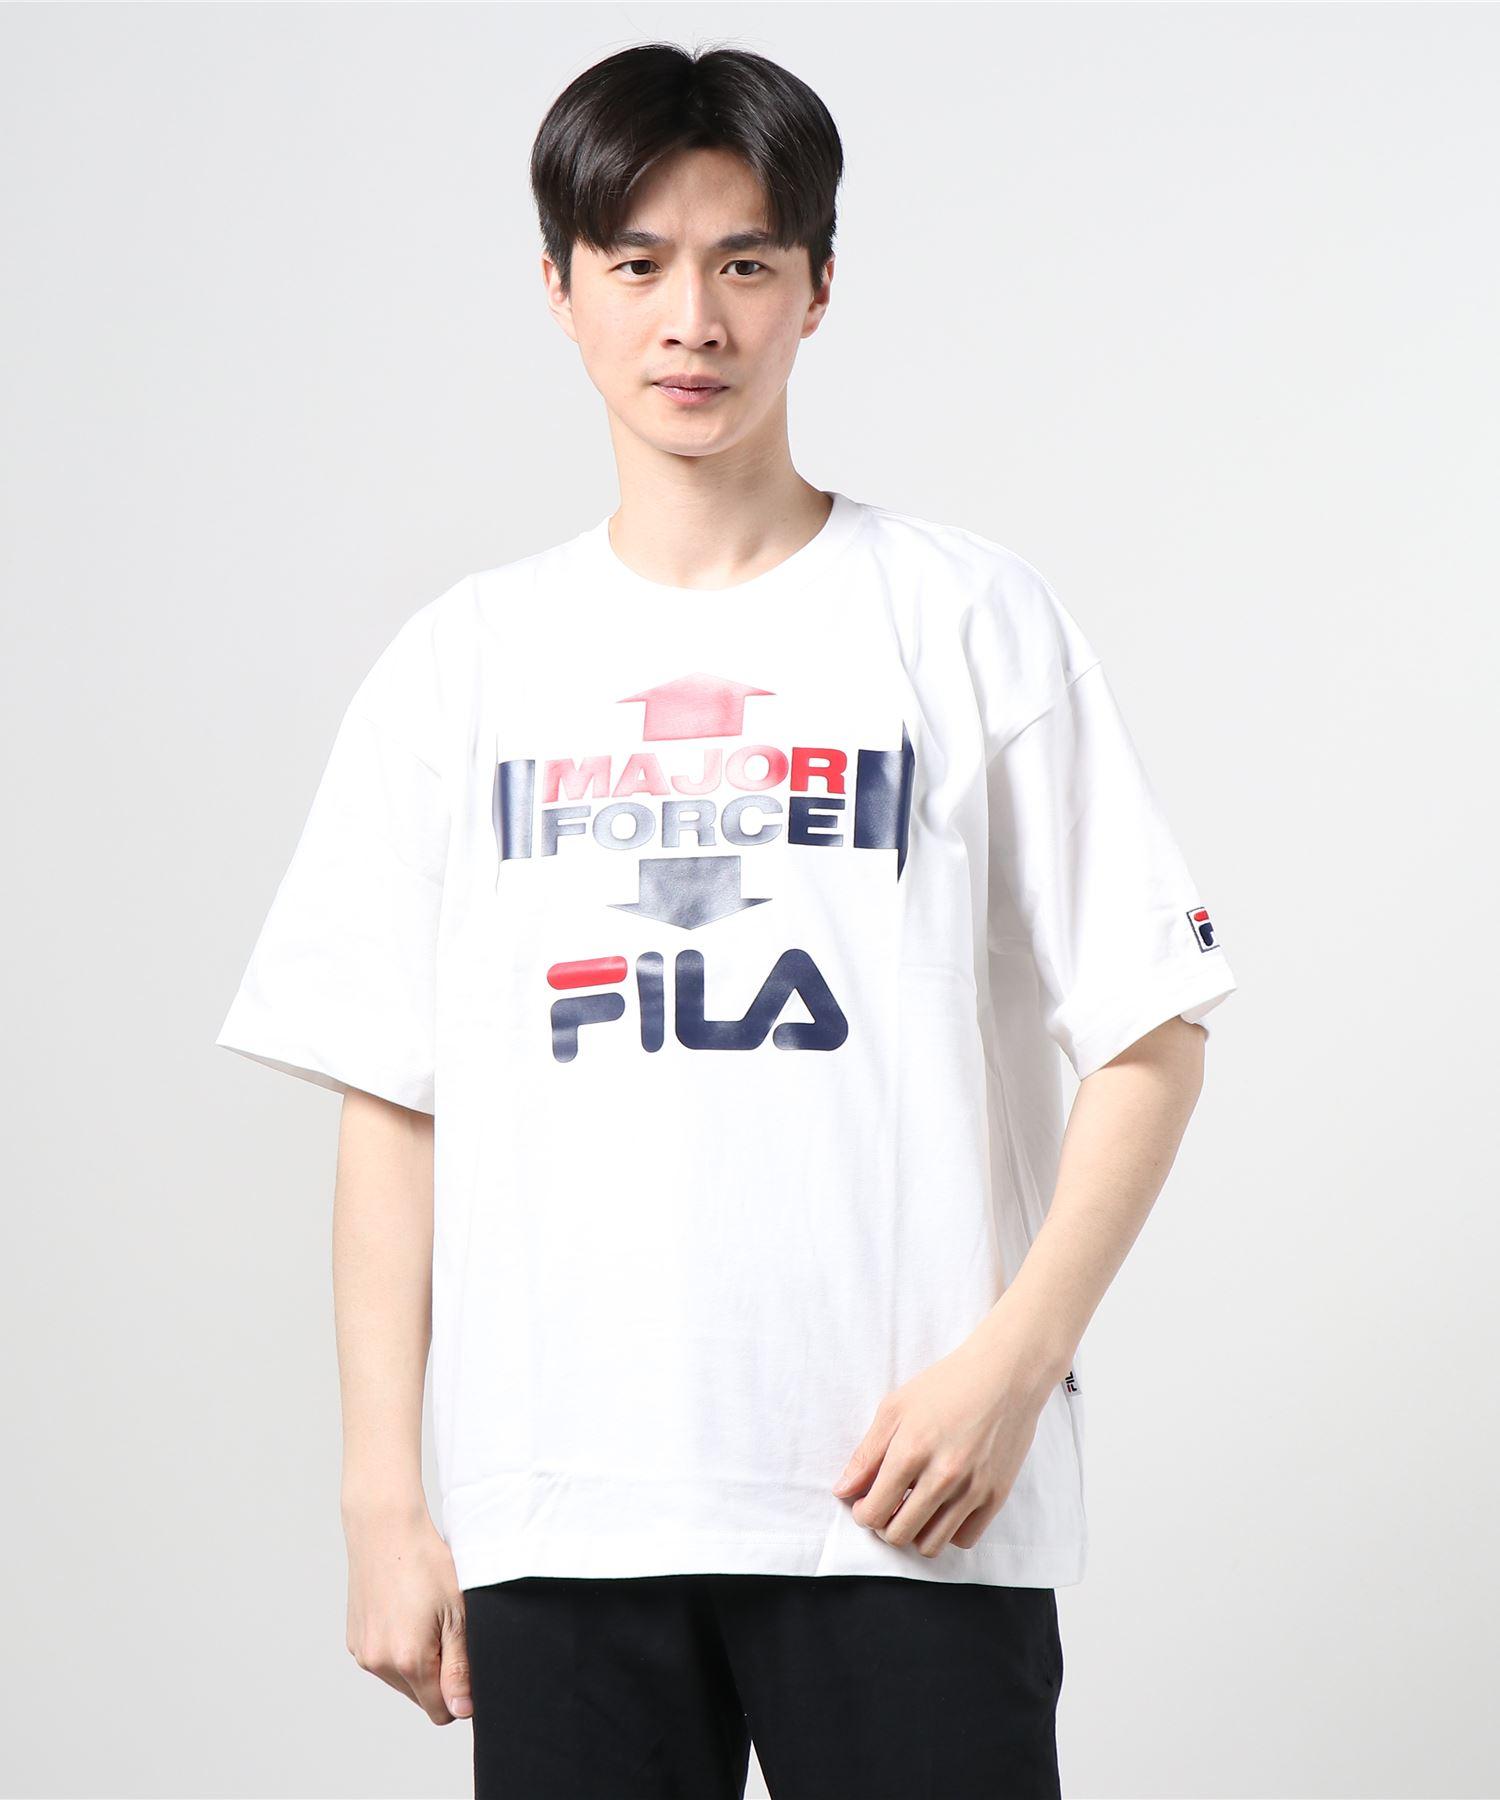 【 FILA / フィラ】 FILA / フィラ × MAJORFORCE S/S T-shirts メジャーフォース Tシャツ FS0102・・ 半袖Tシャツ